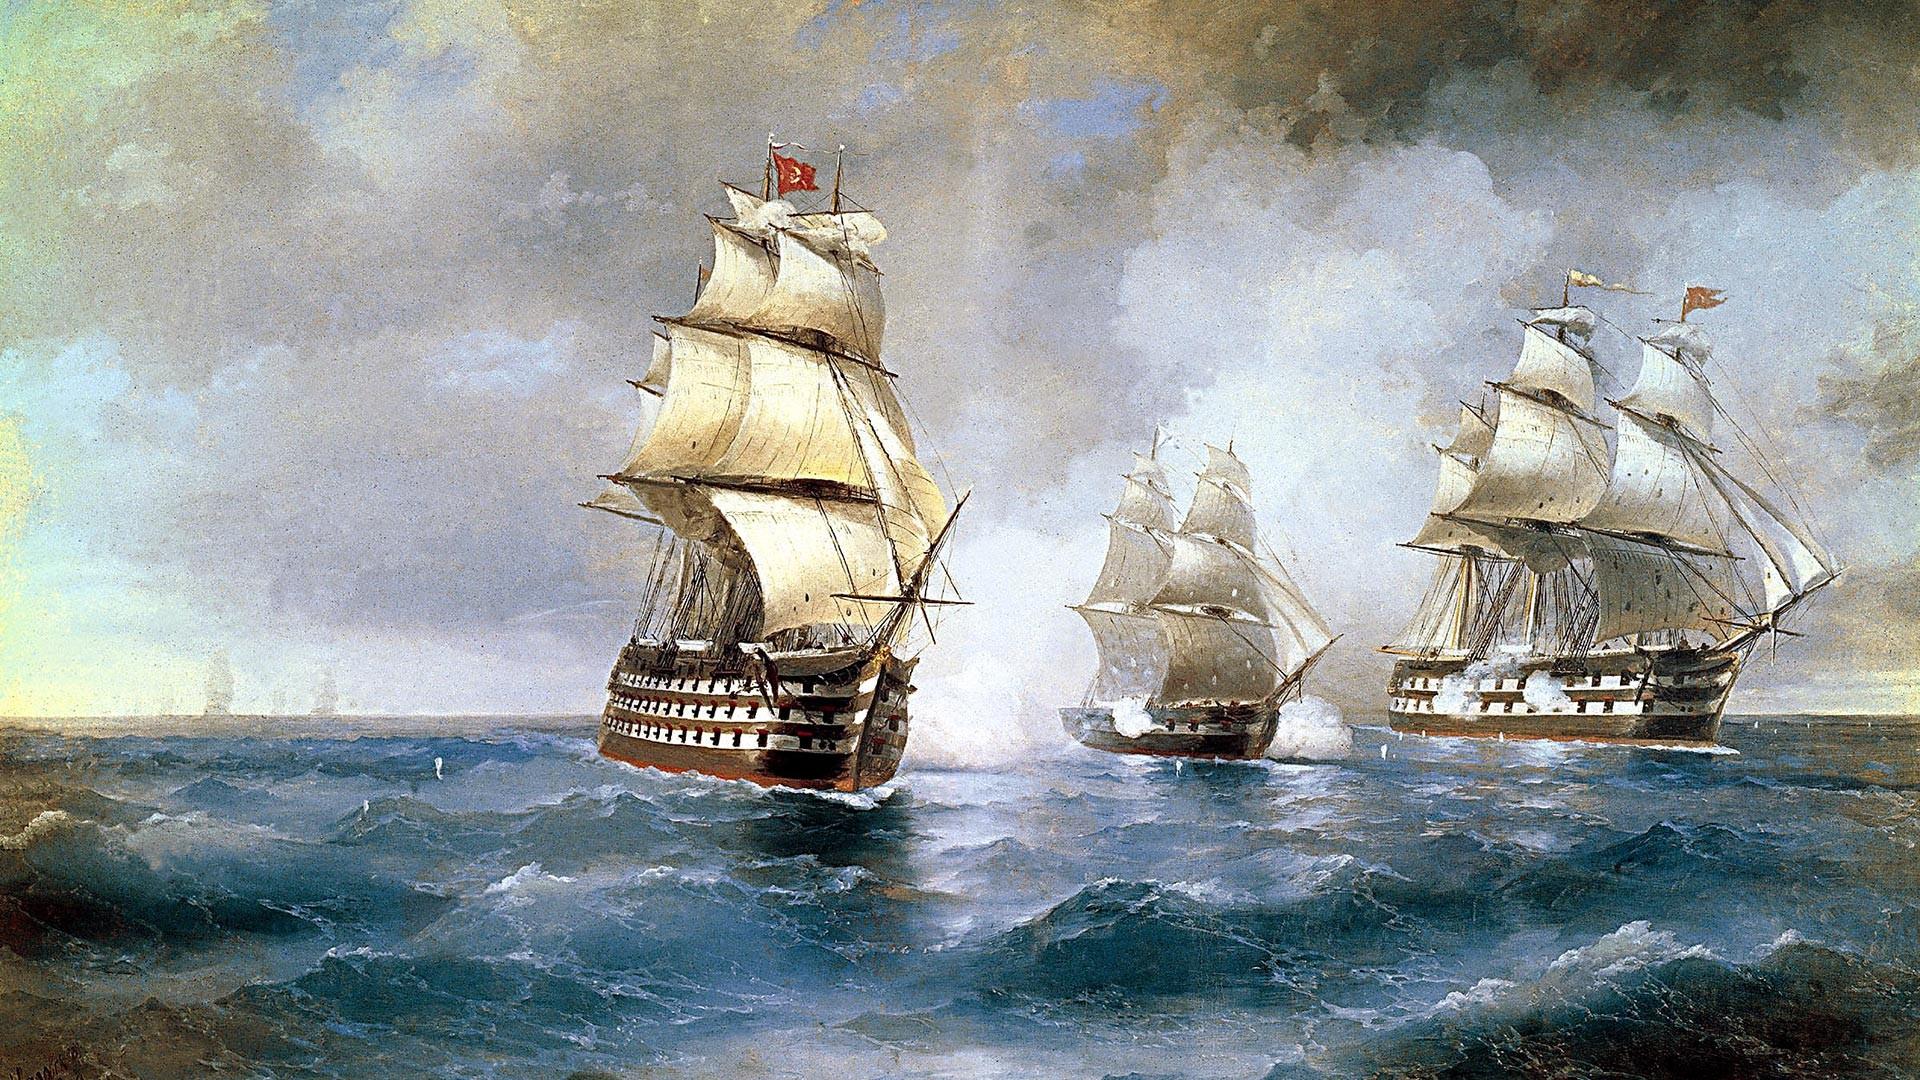 Иван Айвазовский. Бриг «Меркурий», атакованный двумя турецкими кораблями.